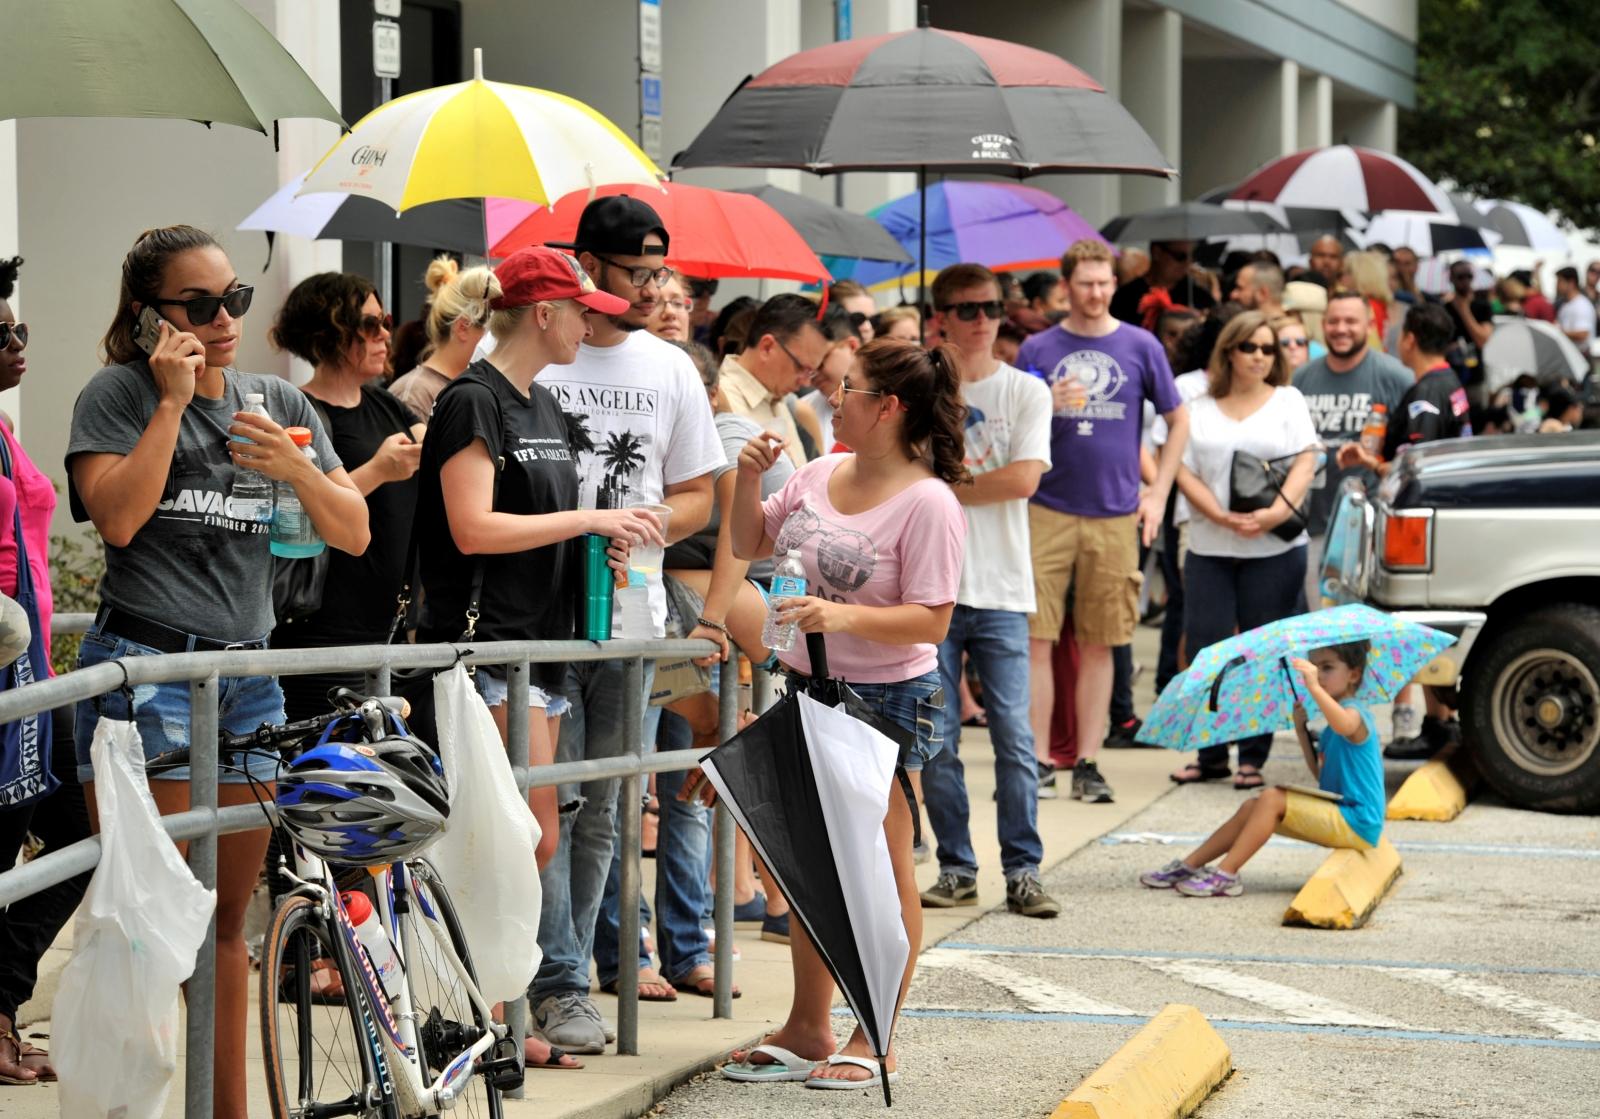 Orlando massacre blood donations